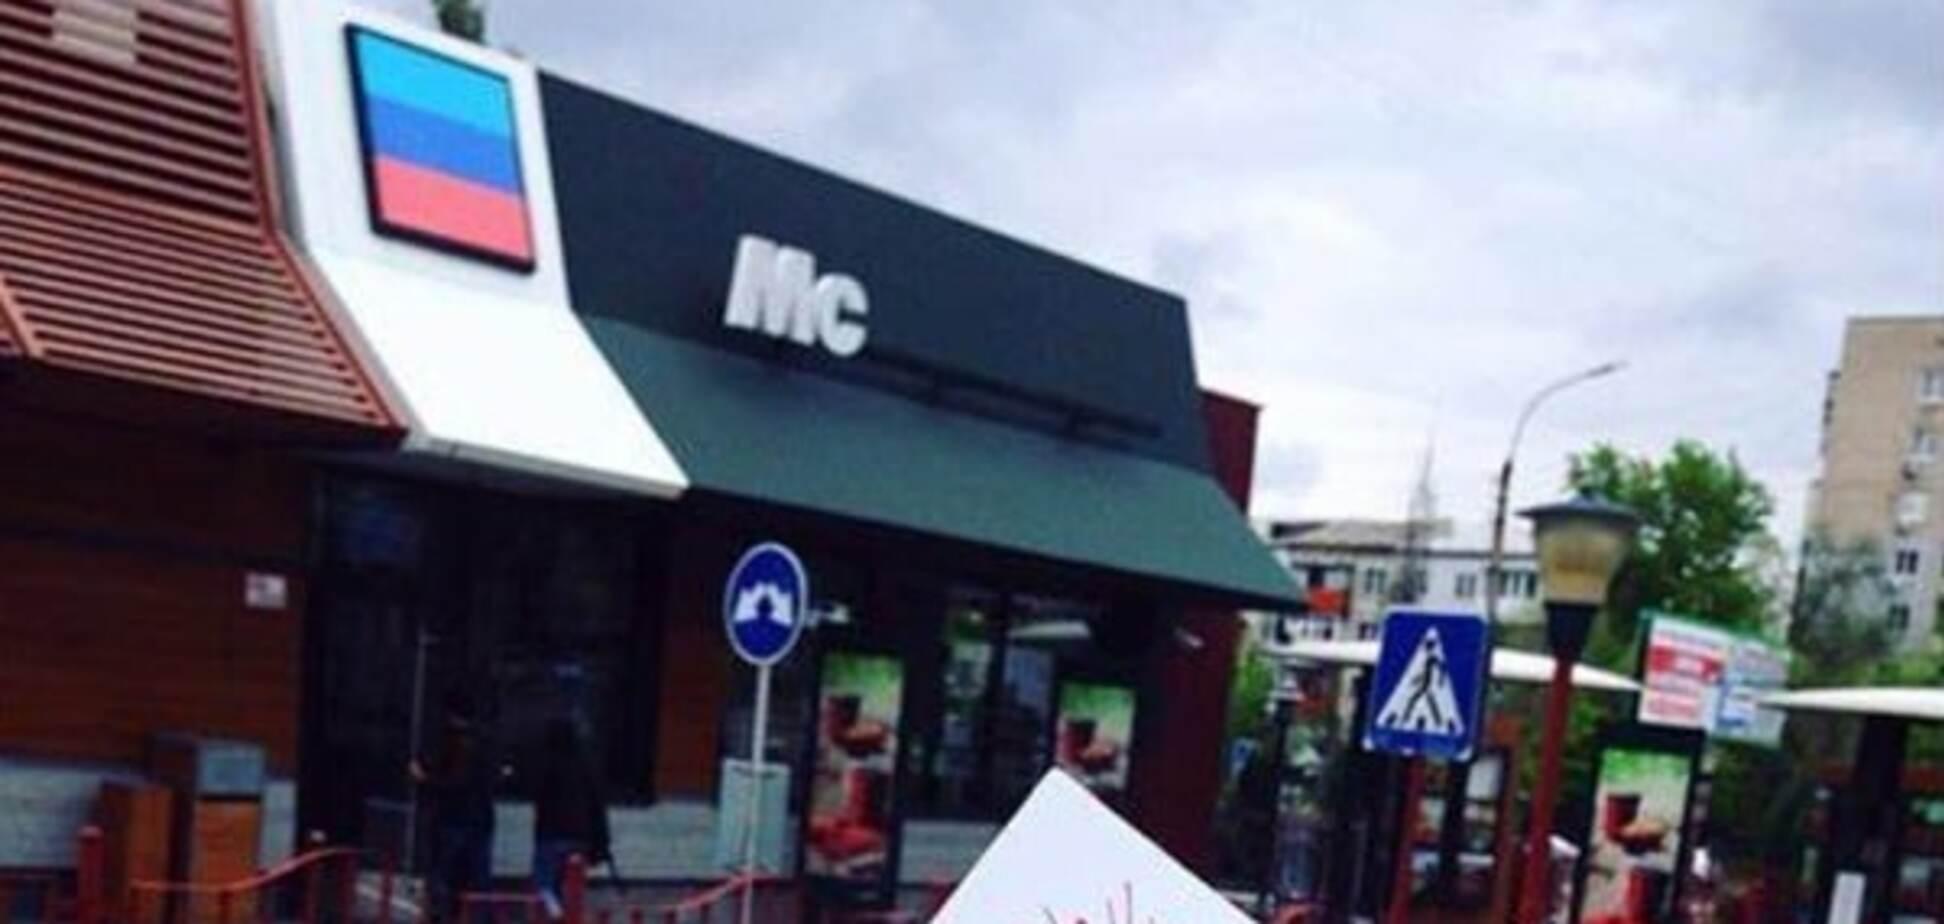 'Мсбургернаш': террористы в Луганске открыли 'отжатый' McDonald's. Фотофакт